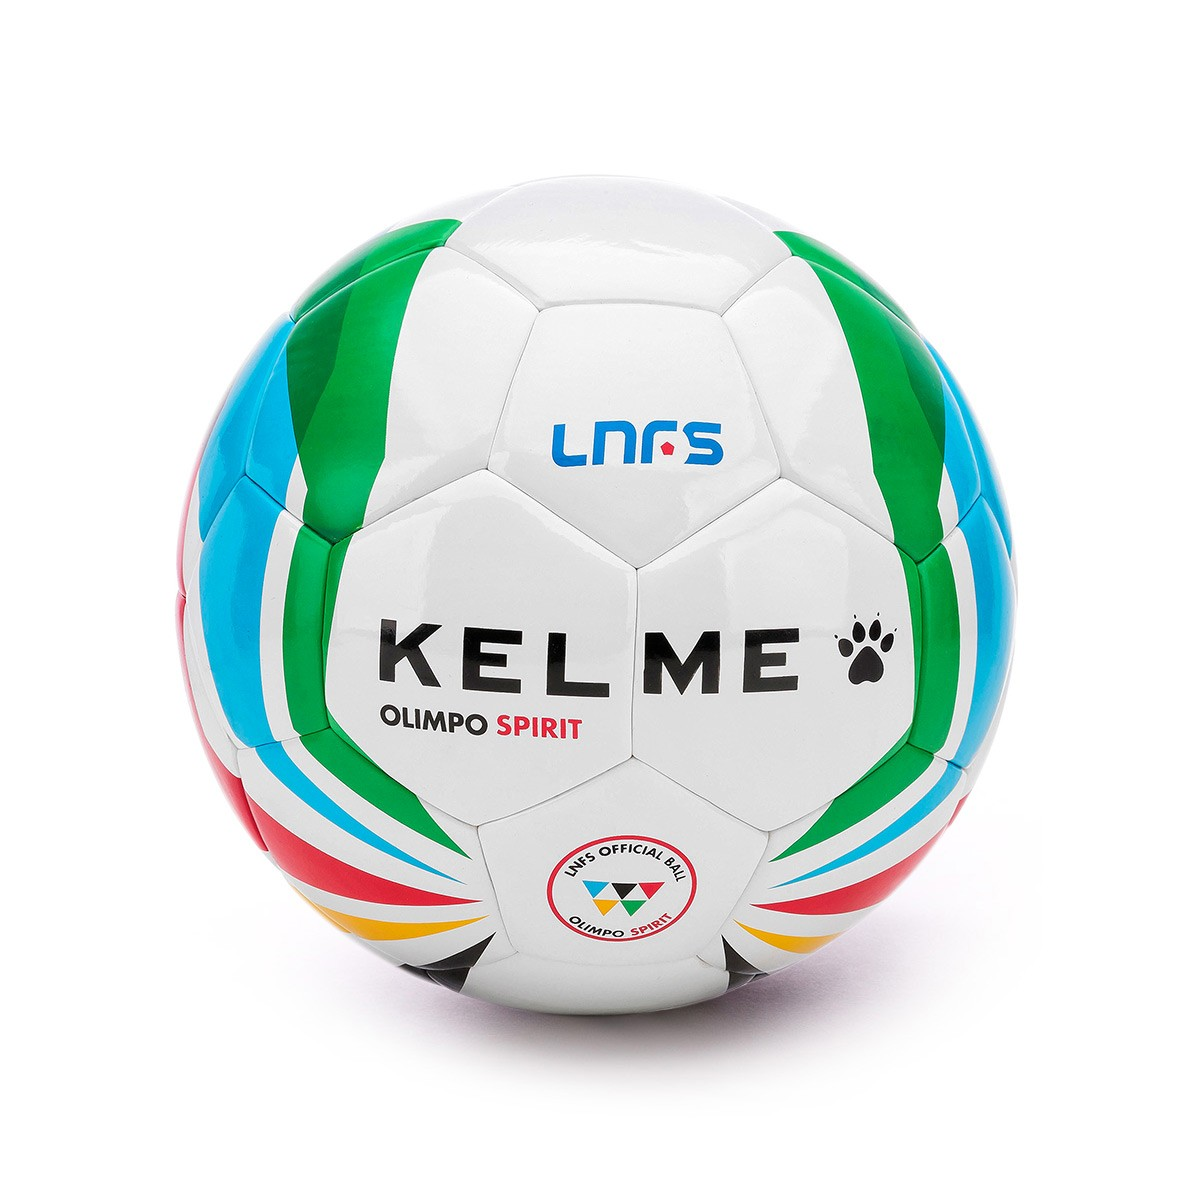 Ball Kelme Olimpo Spirit Oficial LNFS 2018-2019 White - Football ... 3d399ee32317c